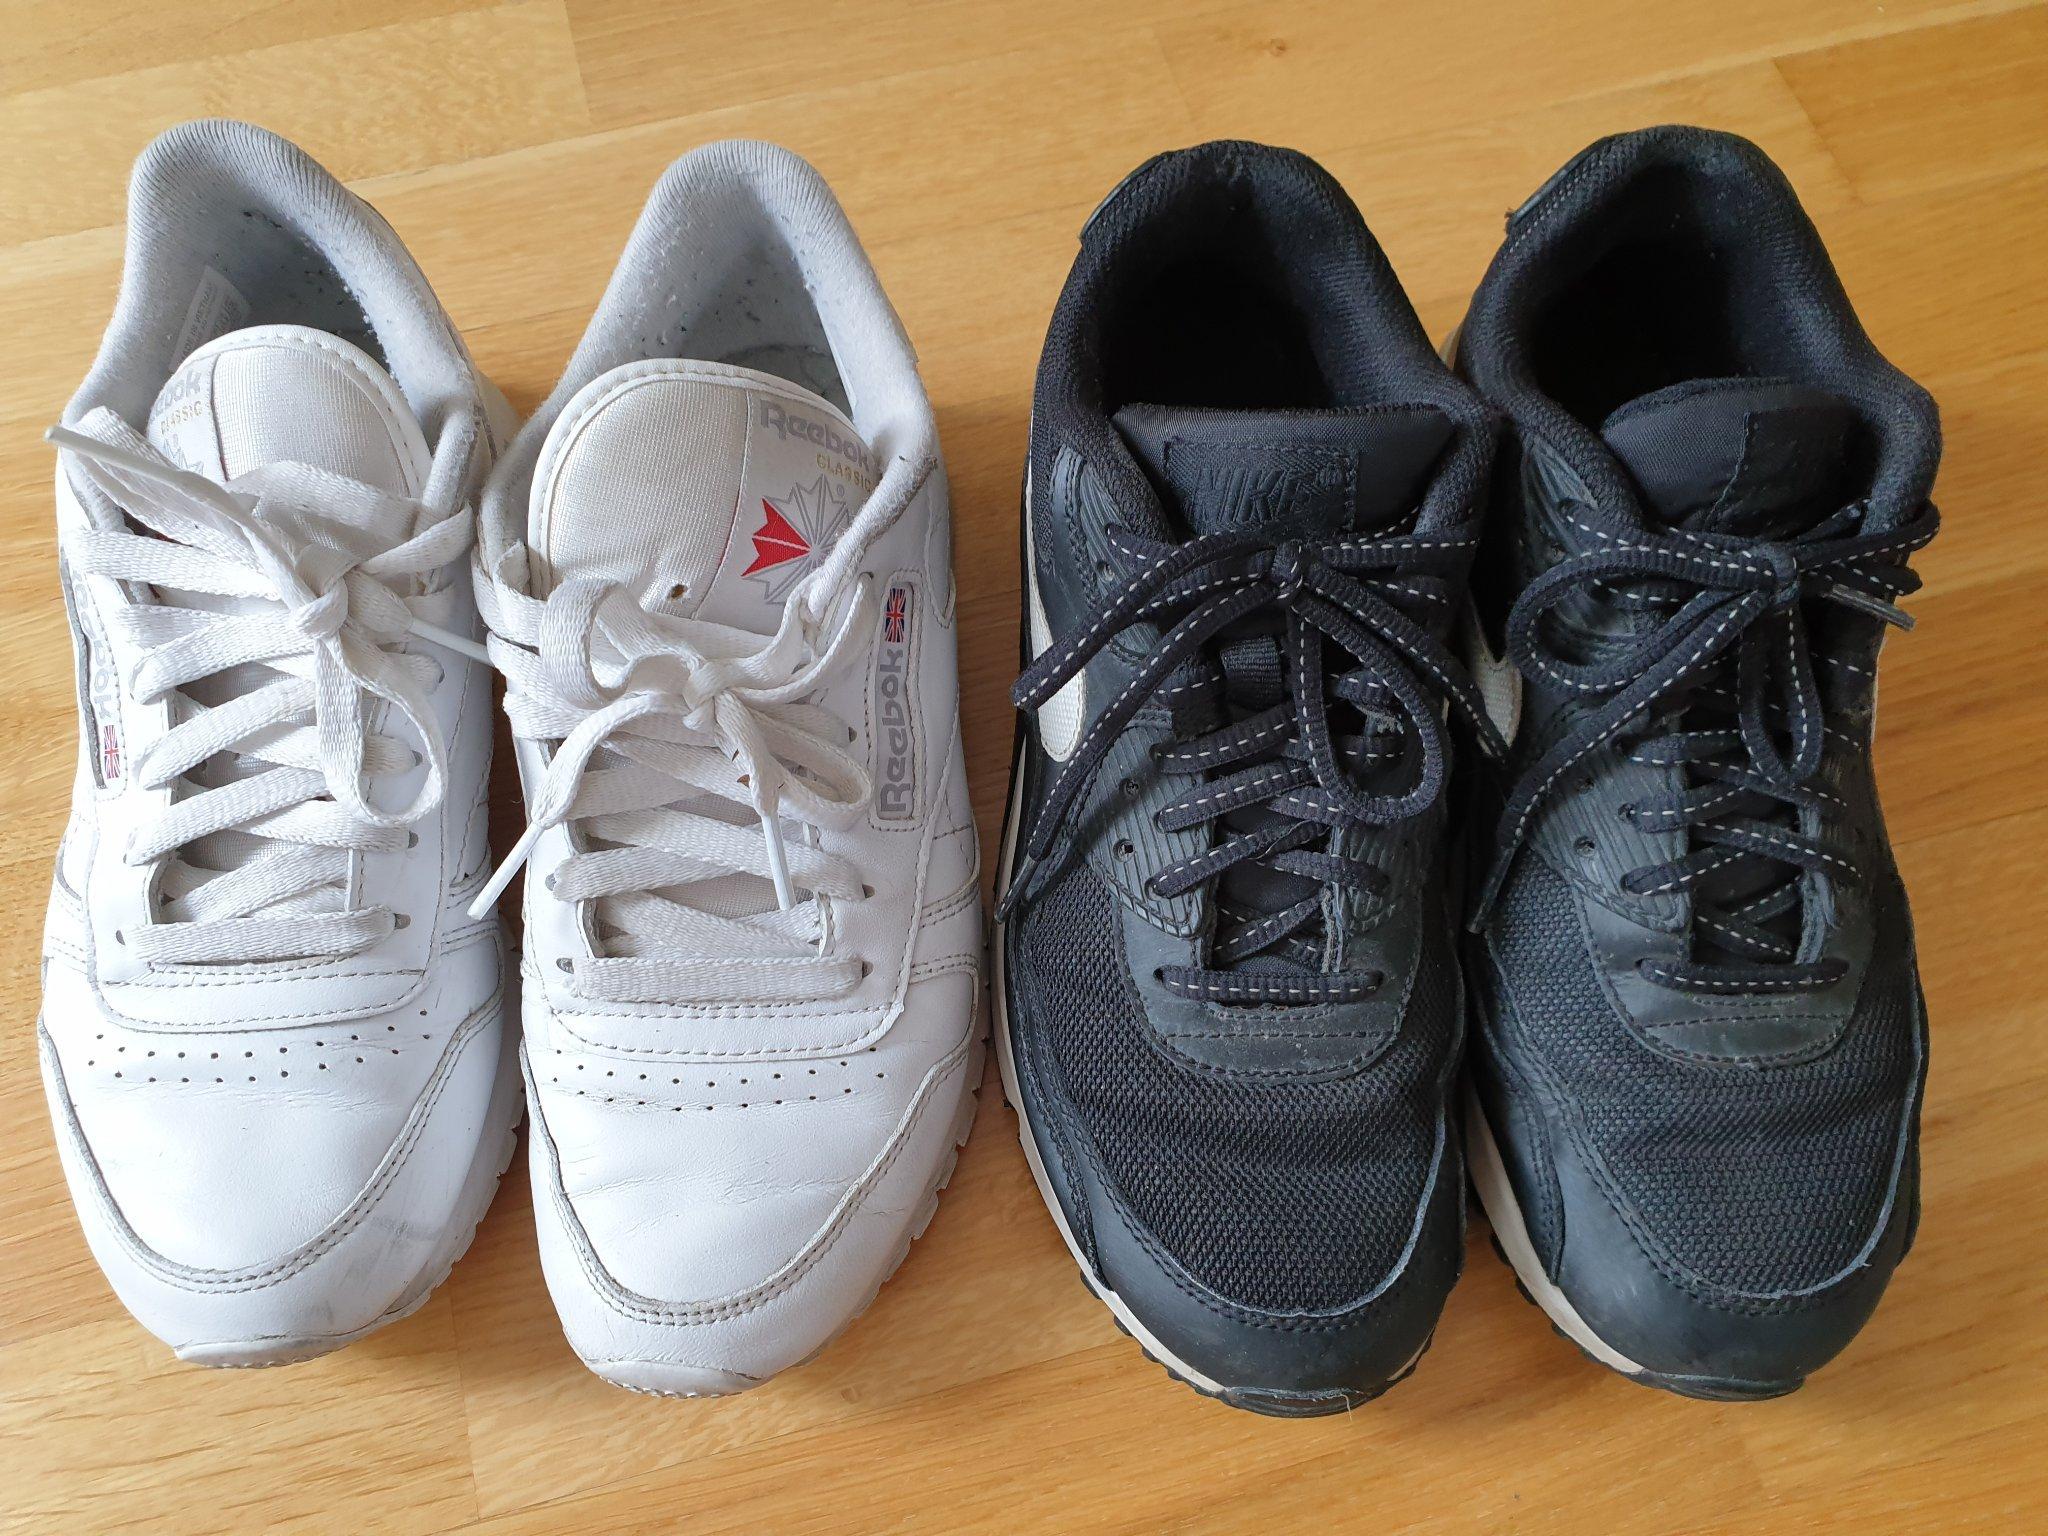 san francisco 112b2 c1604 Två par sneakers, Nike Air Max + Reebok strl 37